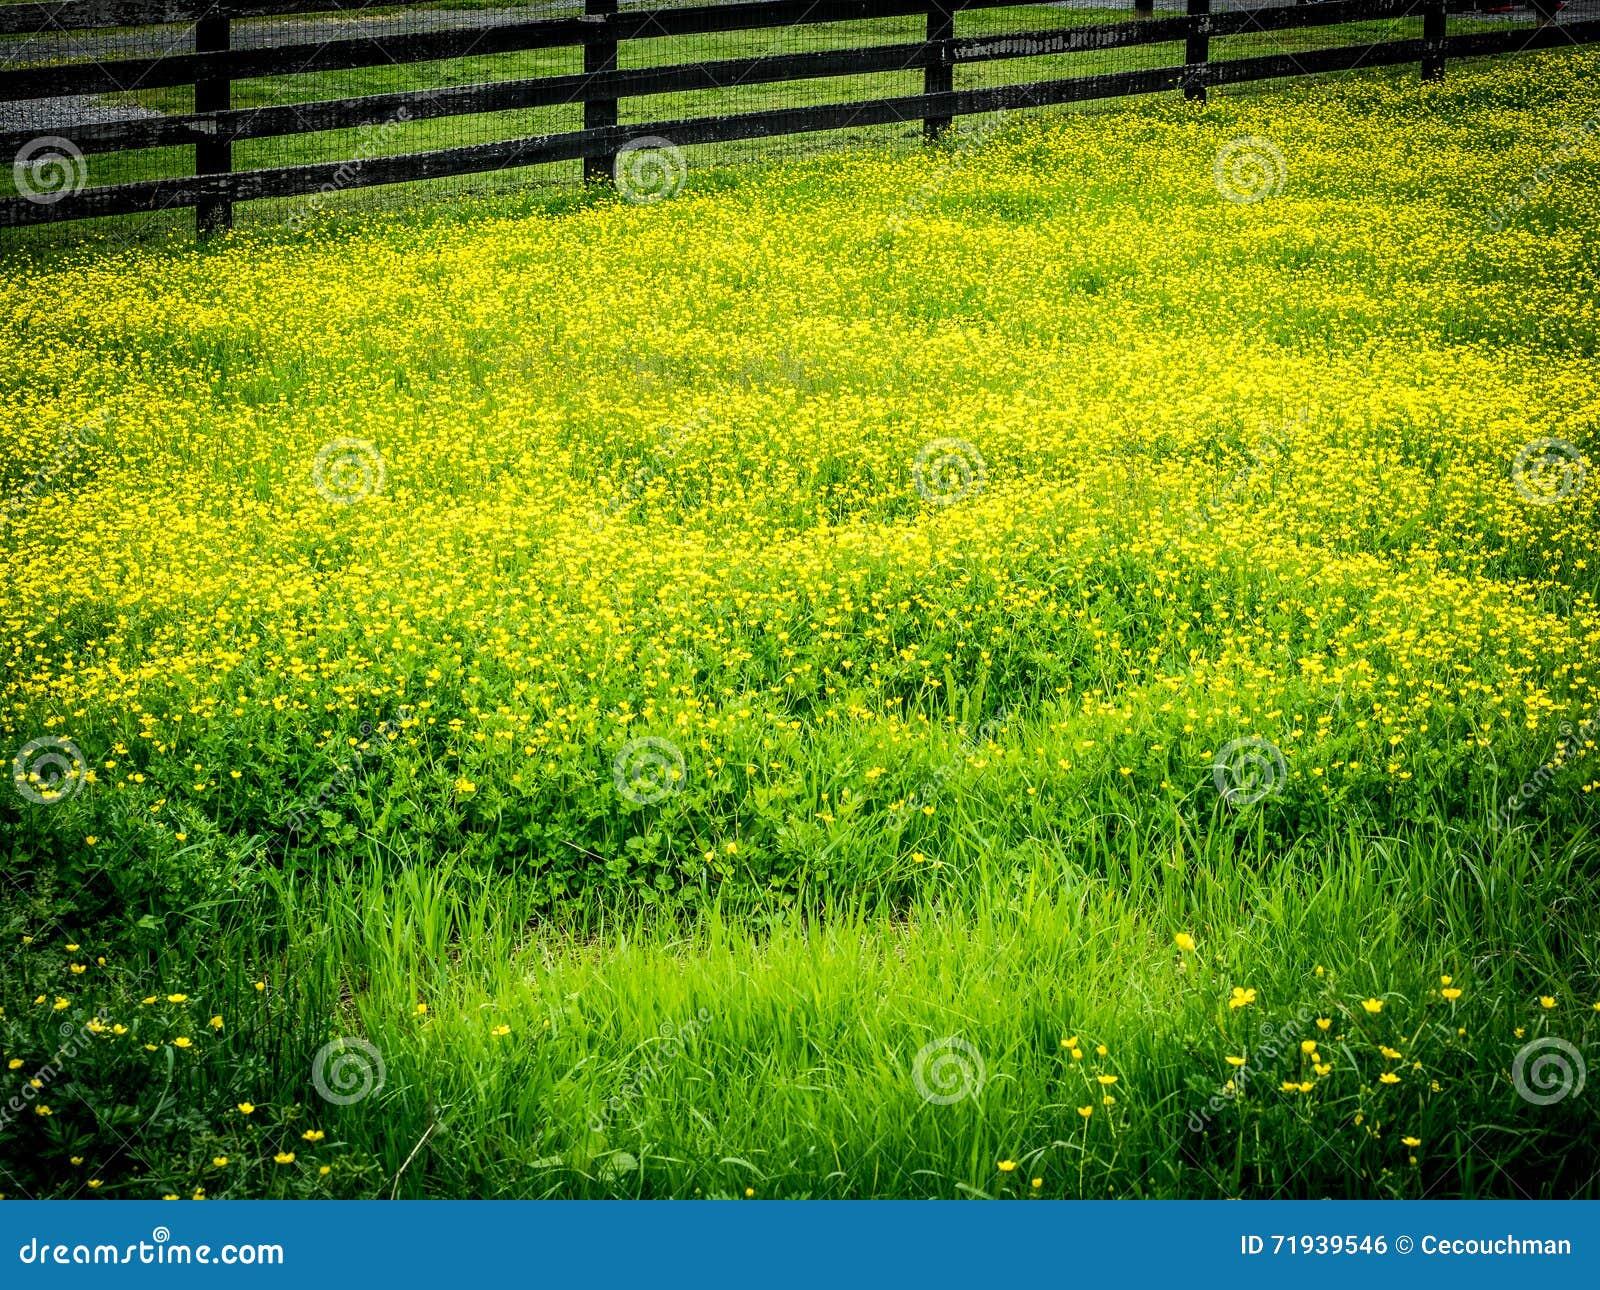 Yellow Flowers In Pasture Stock Photo Image Of Virginia 71939546